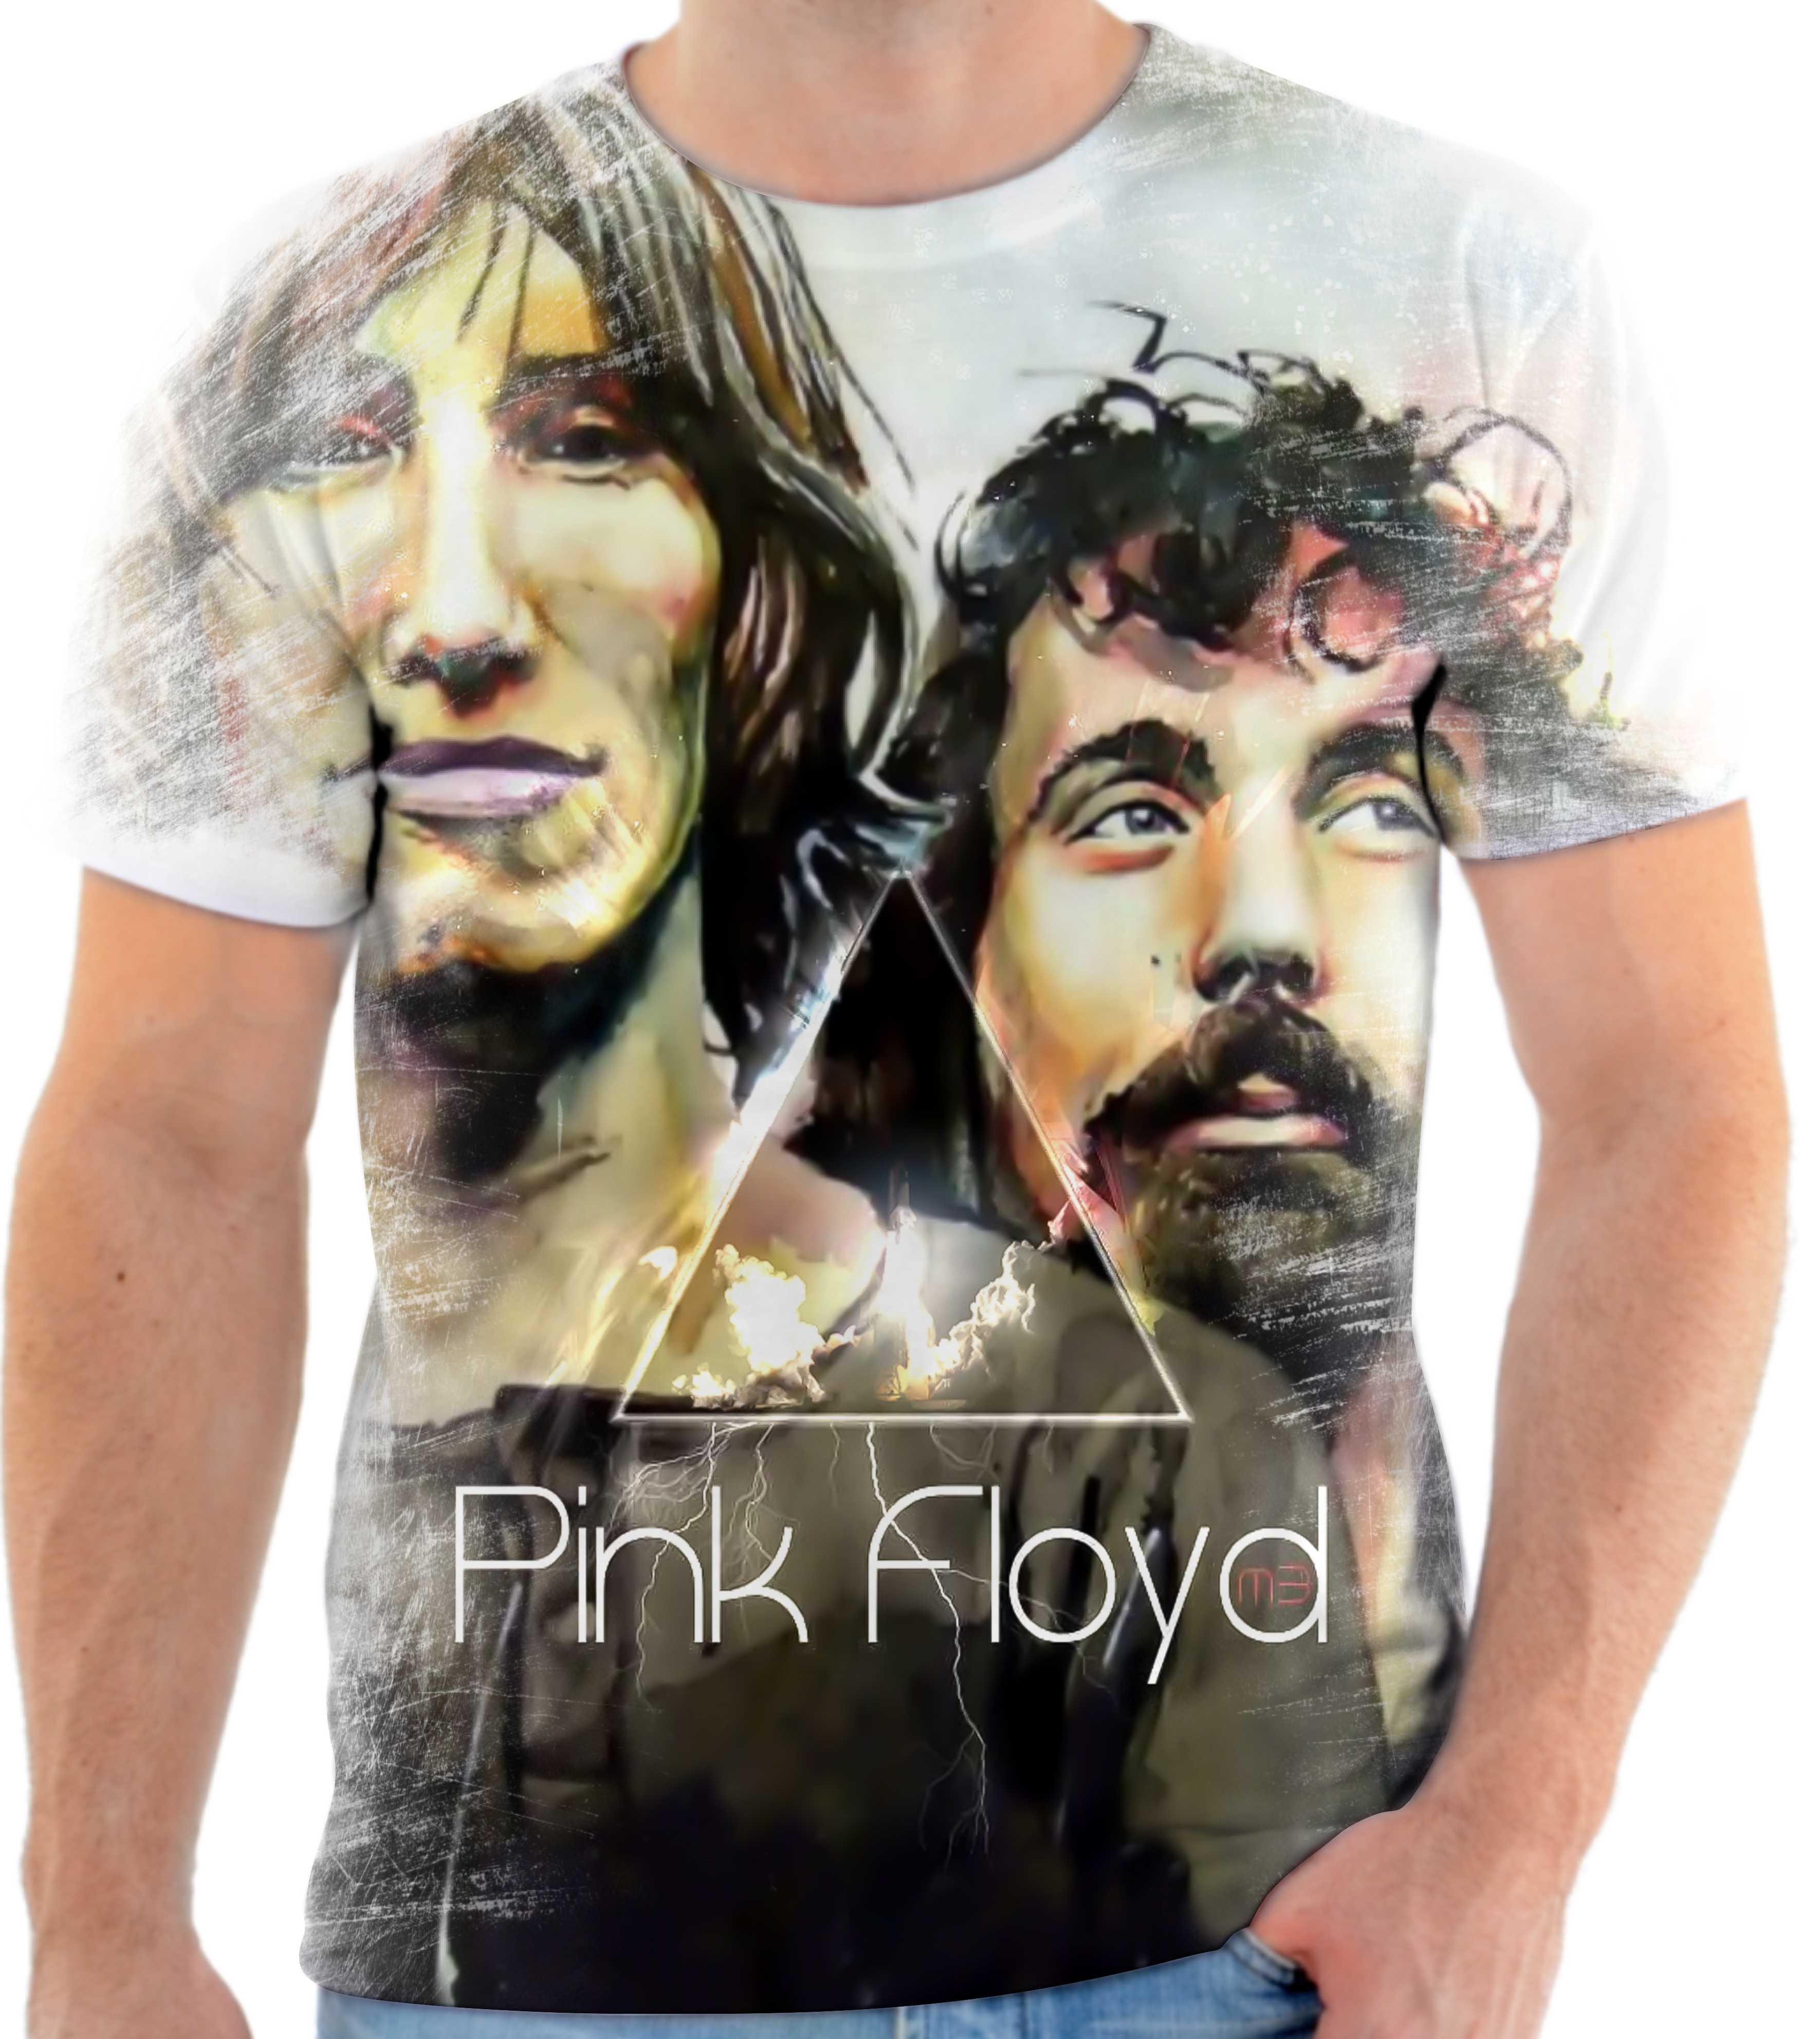 musicas pink floyd krafta